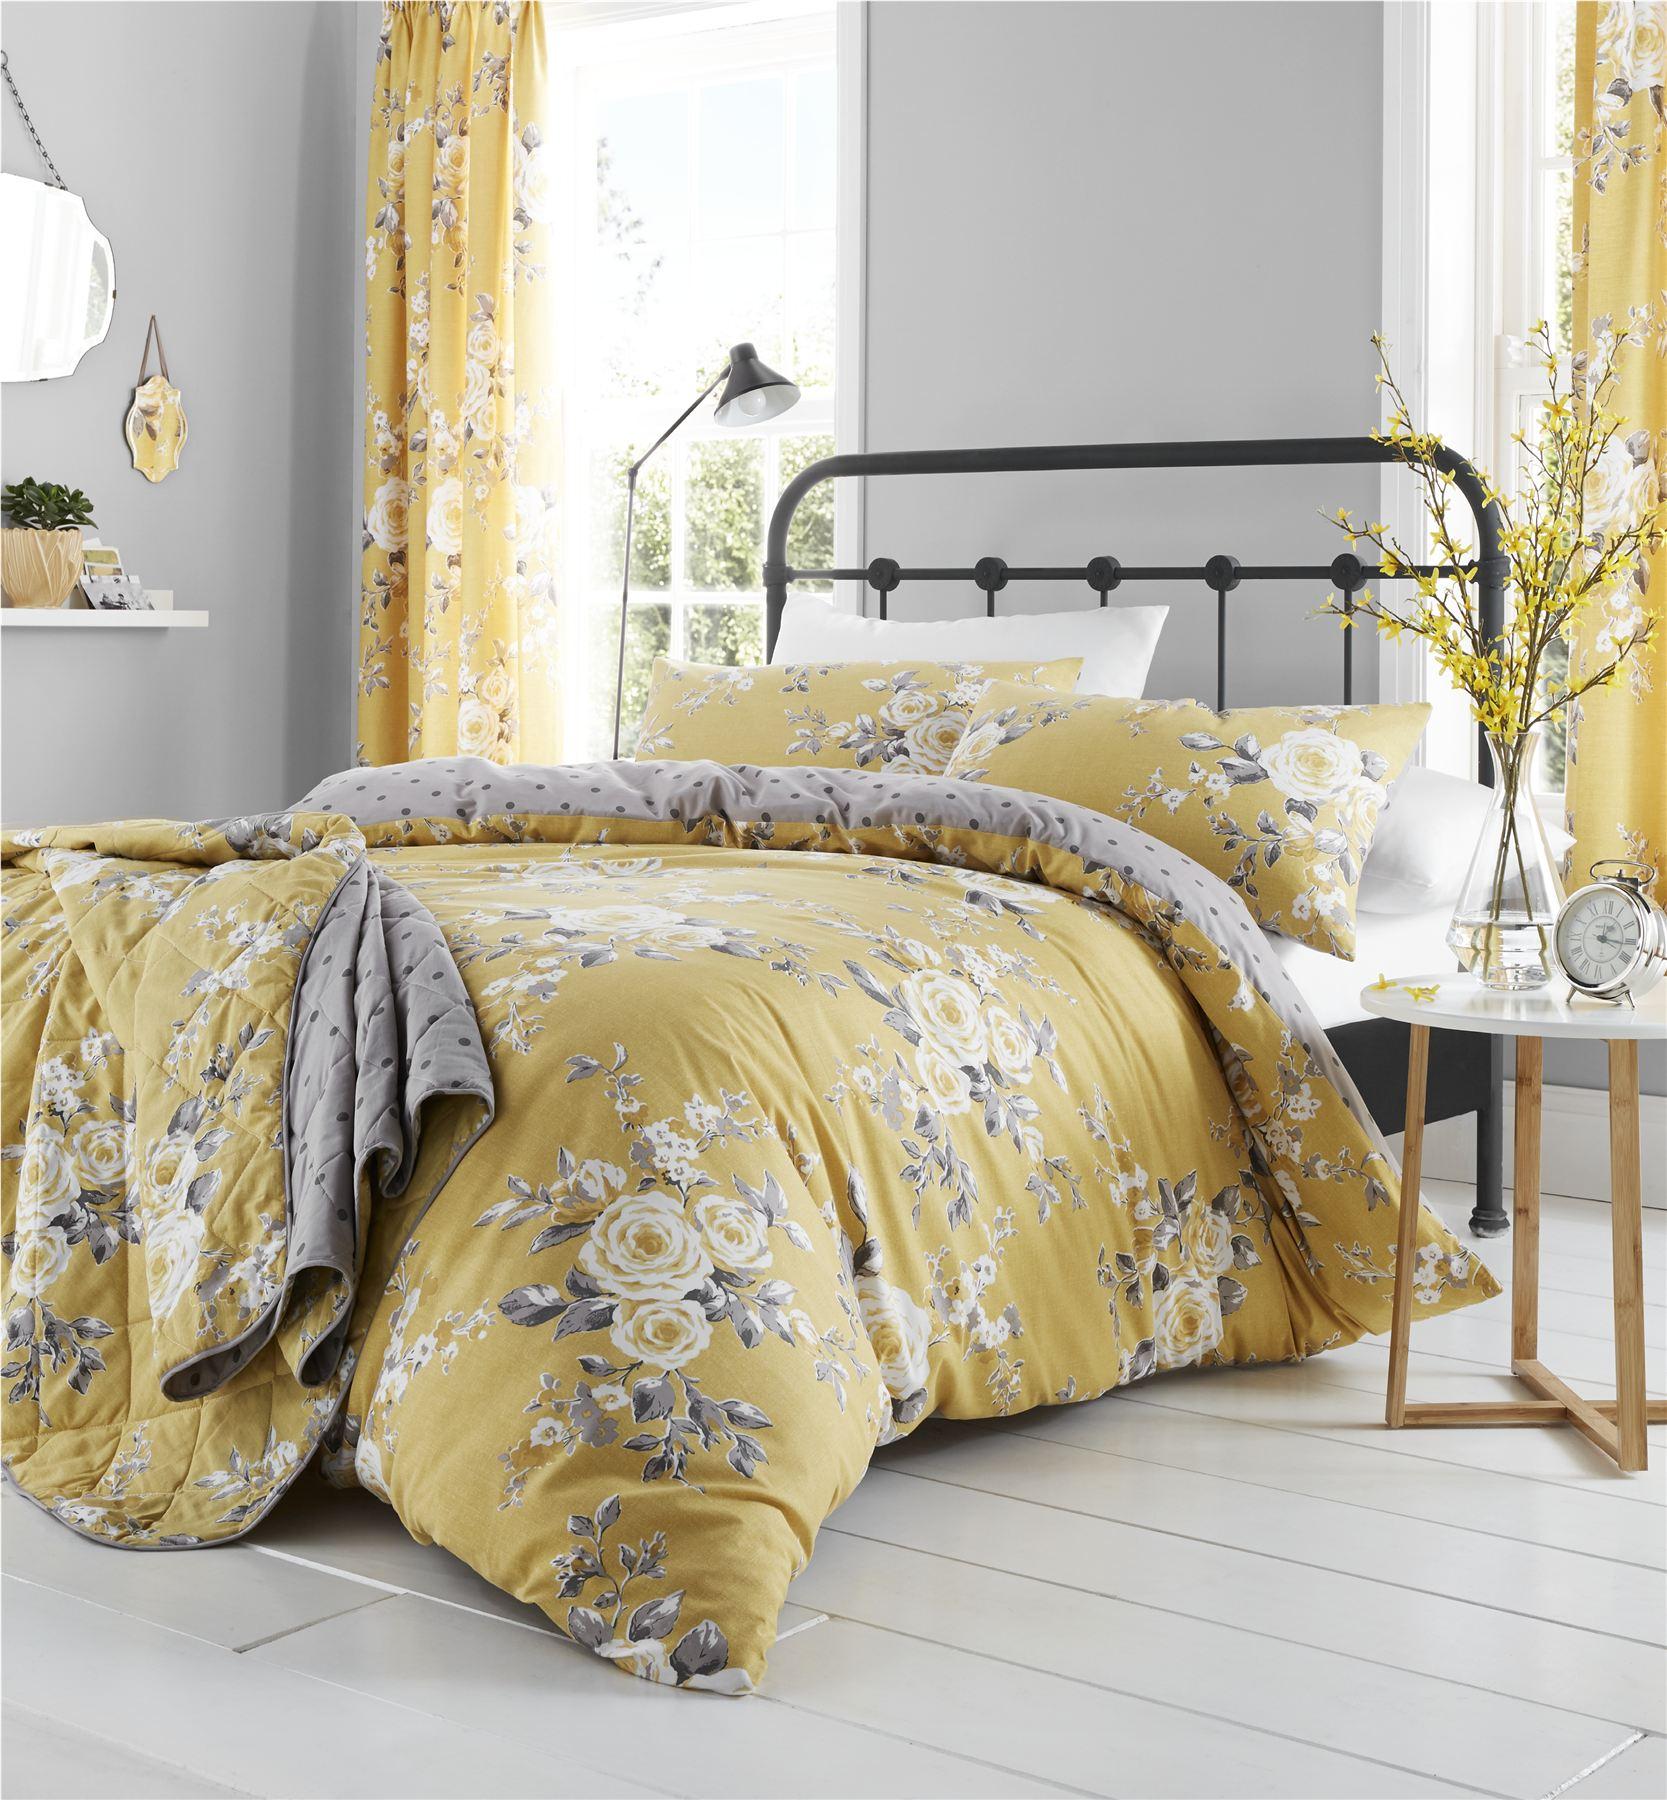 cotton covers linen homewares shop mckenzie bedspreads duvets mm willis duvet set waffle